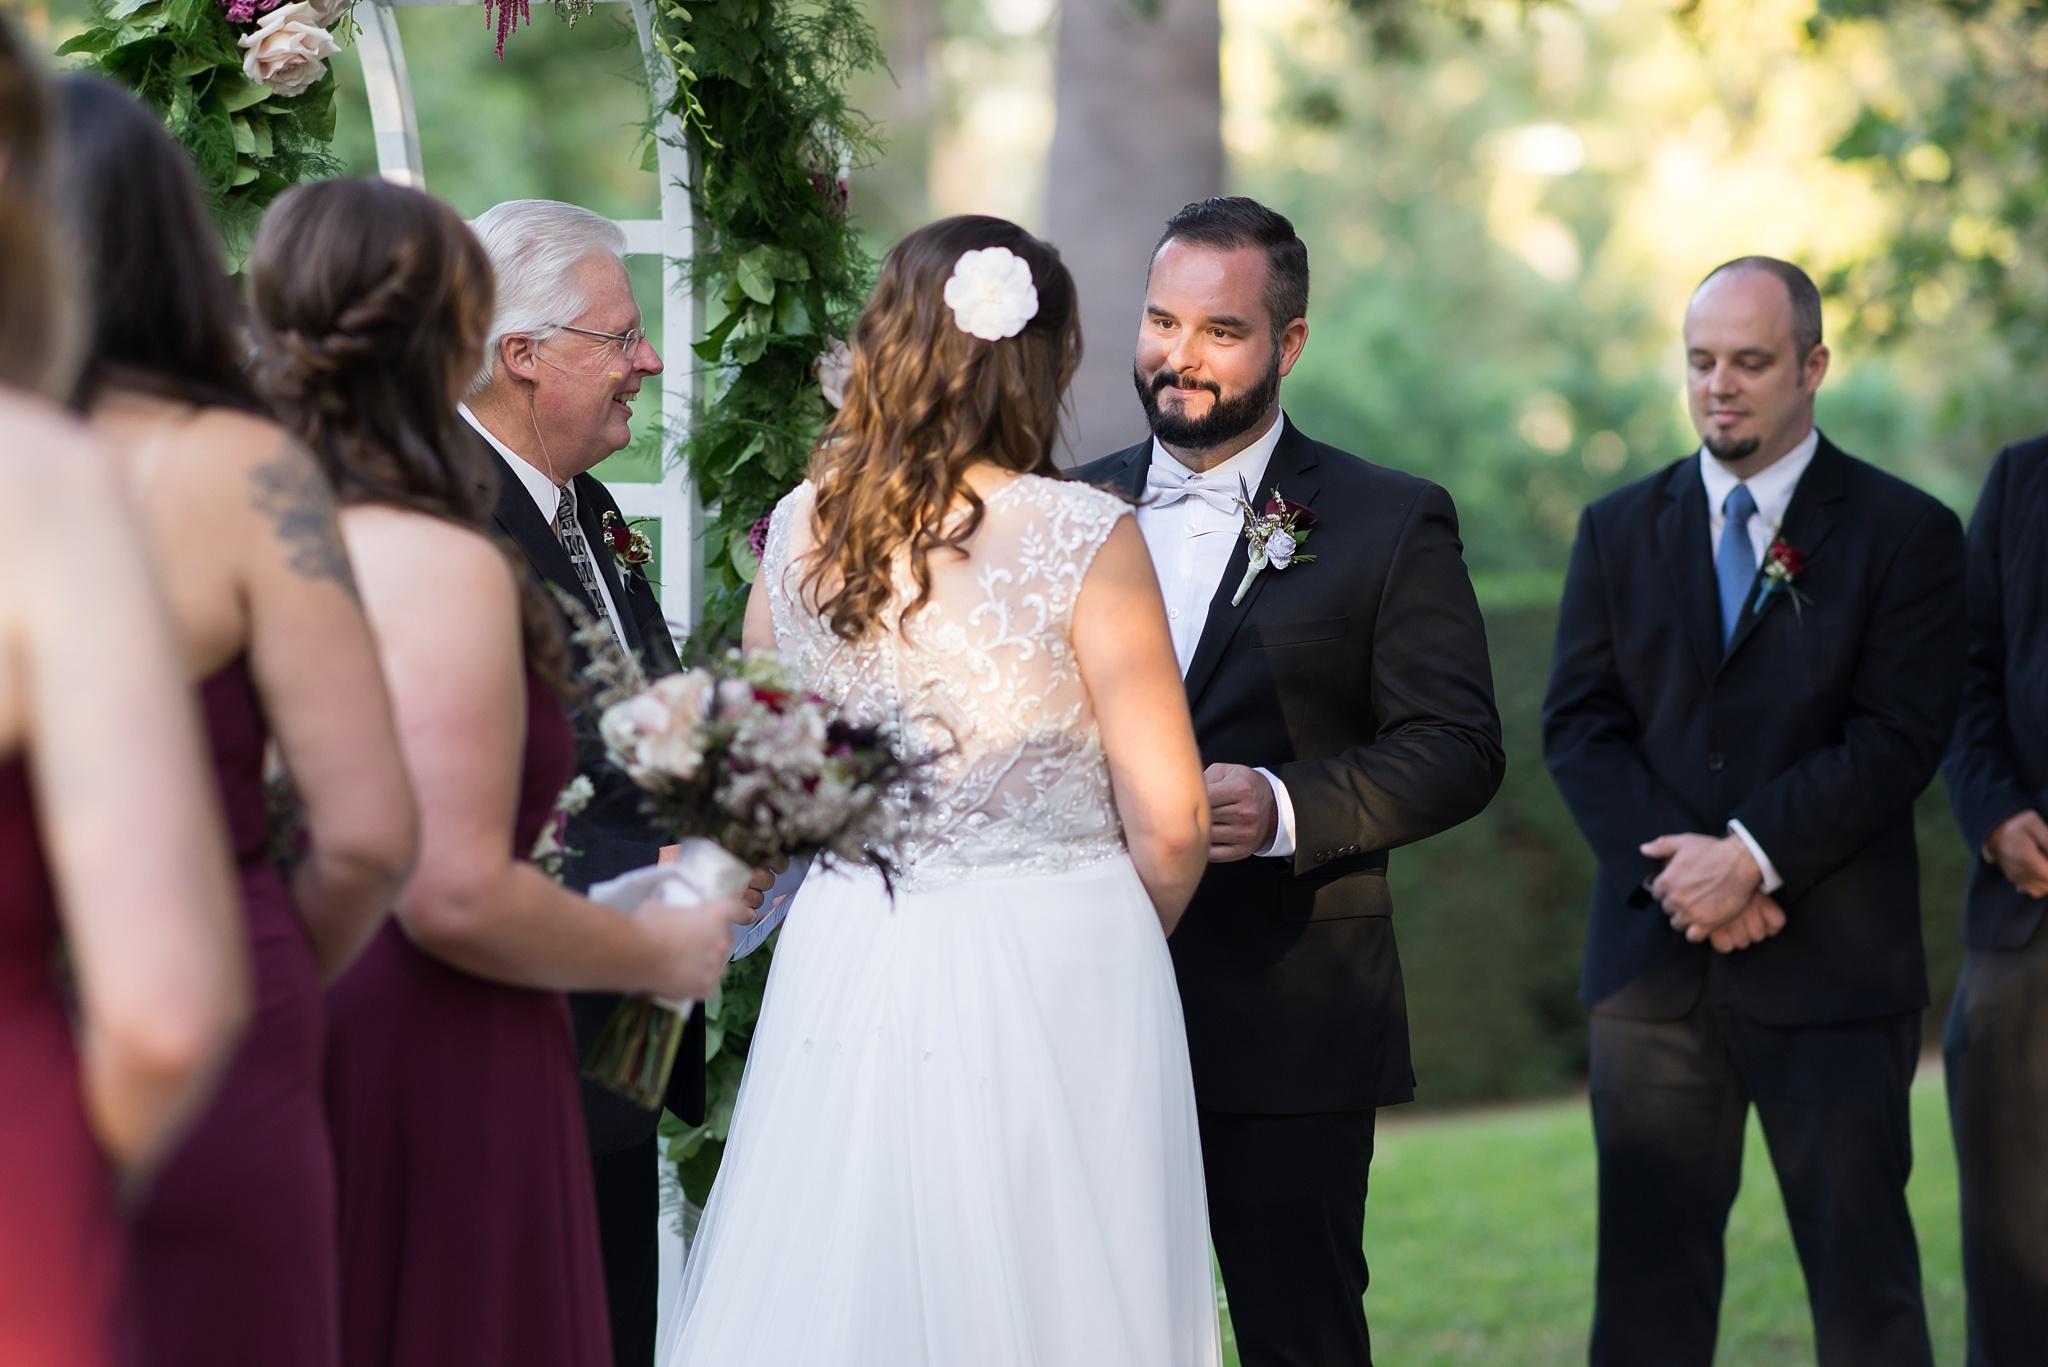 TommyandAmanda_WEDDING_BrienneMichelle_Ceremony_064_BLOG.jpg